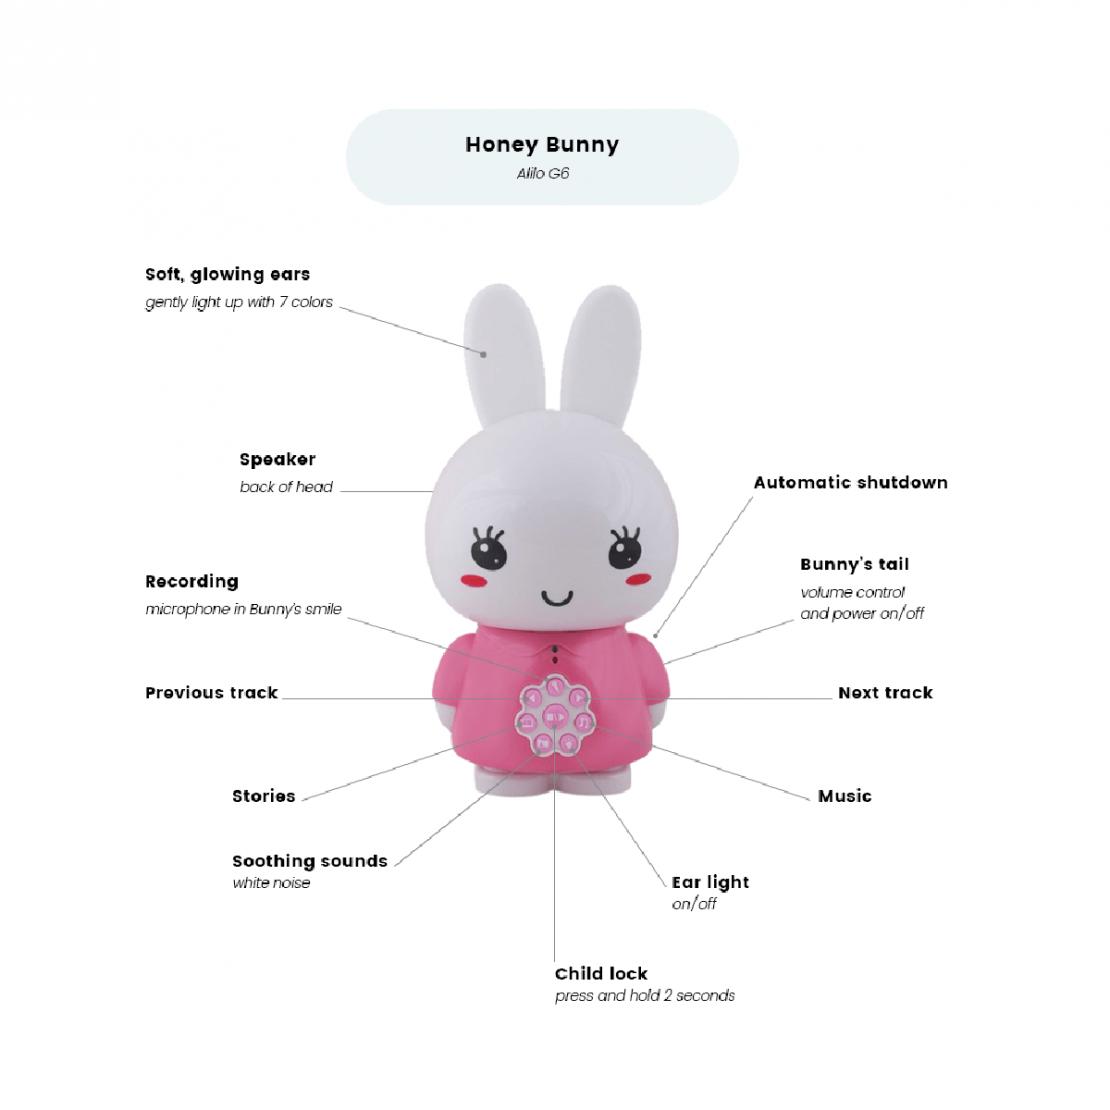 Honey Bunny Features